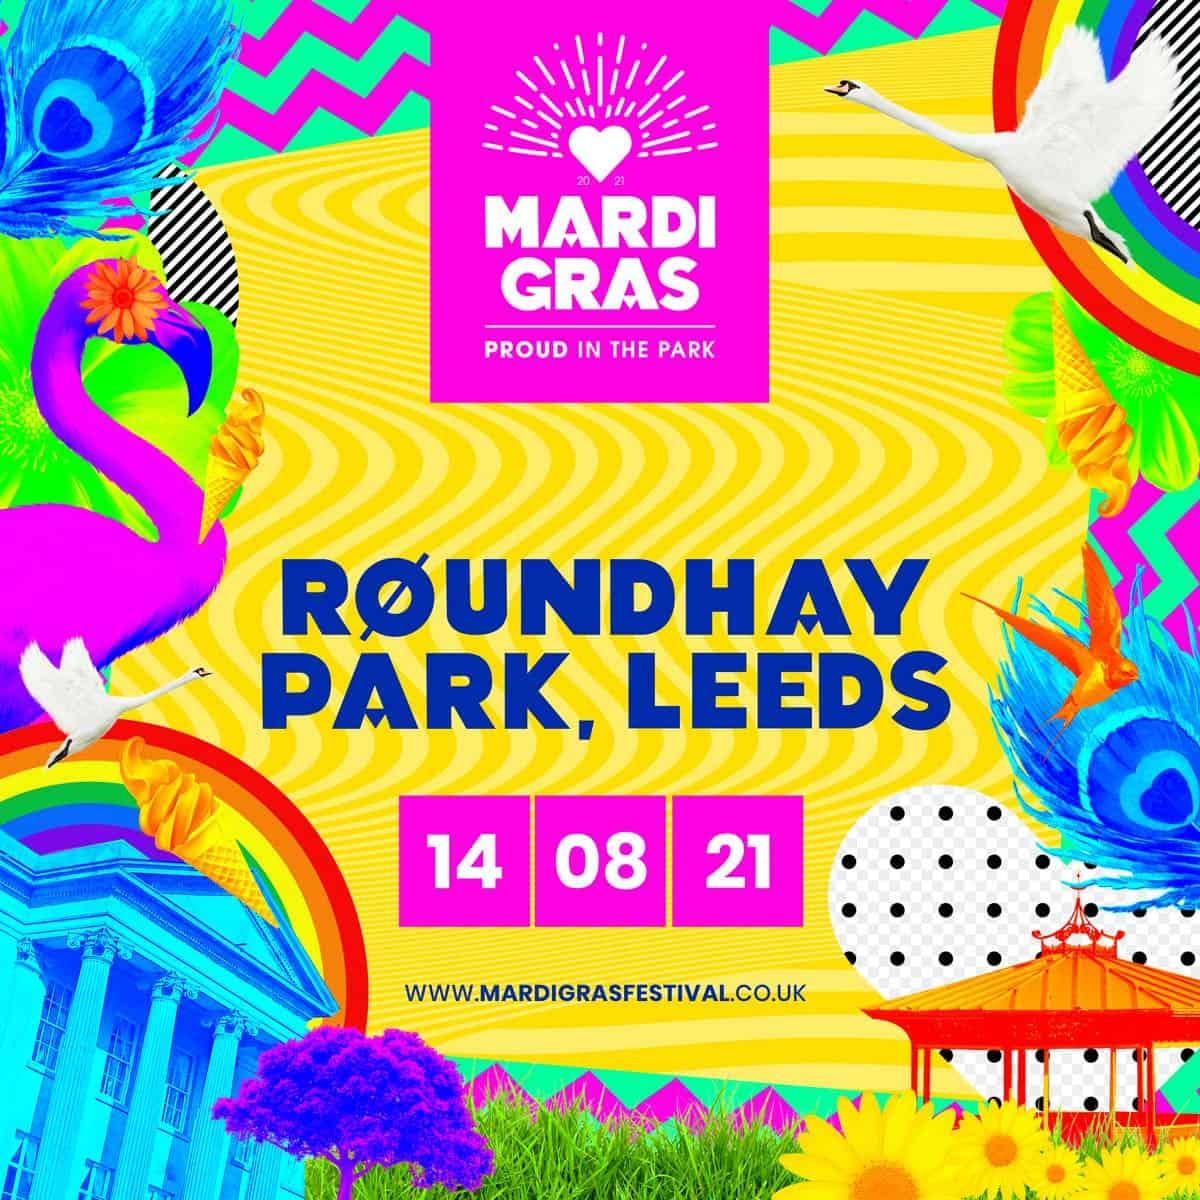 Mardi Gras - Υπερήφανος στο πάρκο - Λιντς